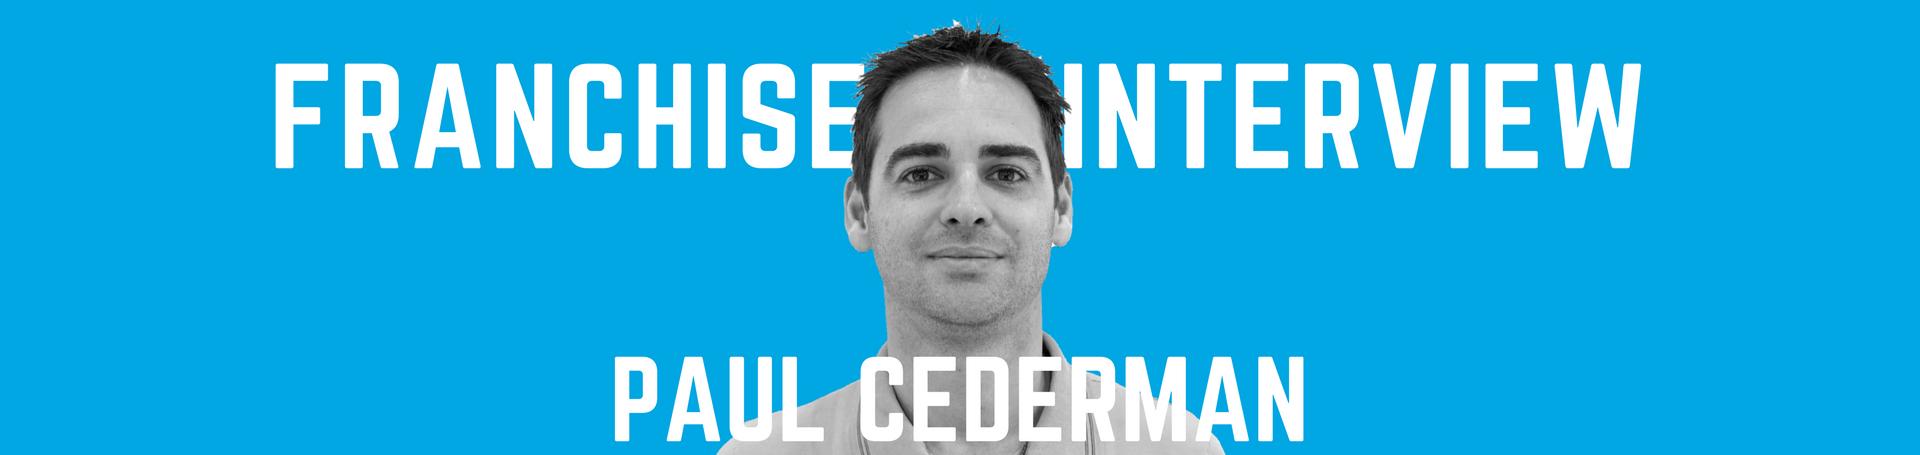 Paul Cederman